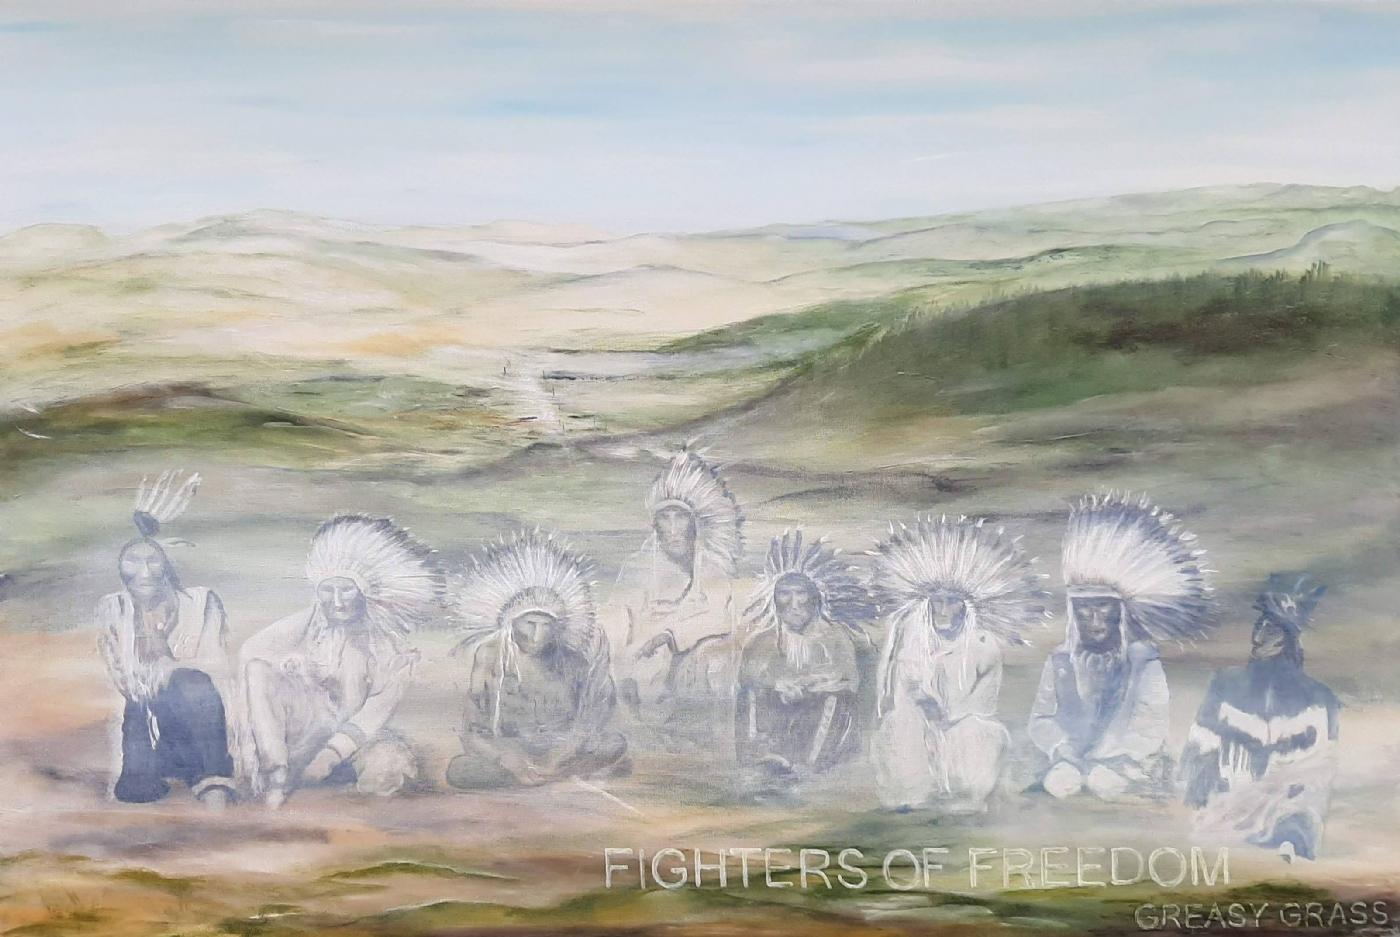 Fighters of freedom. | Maleri